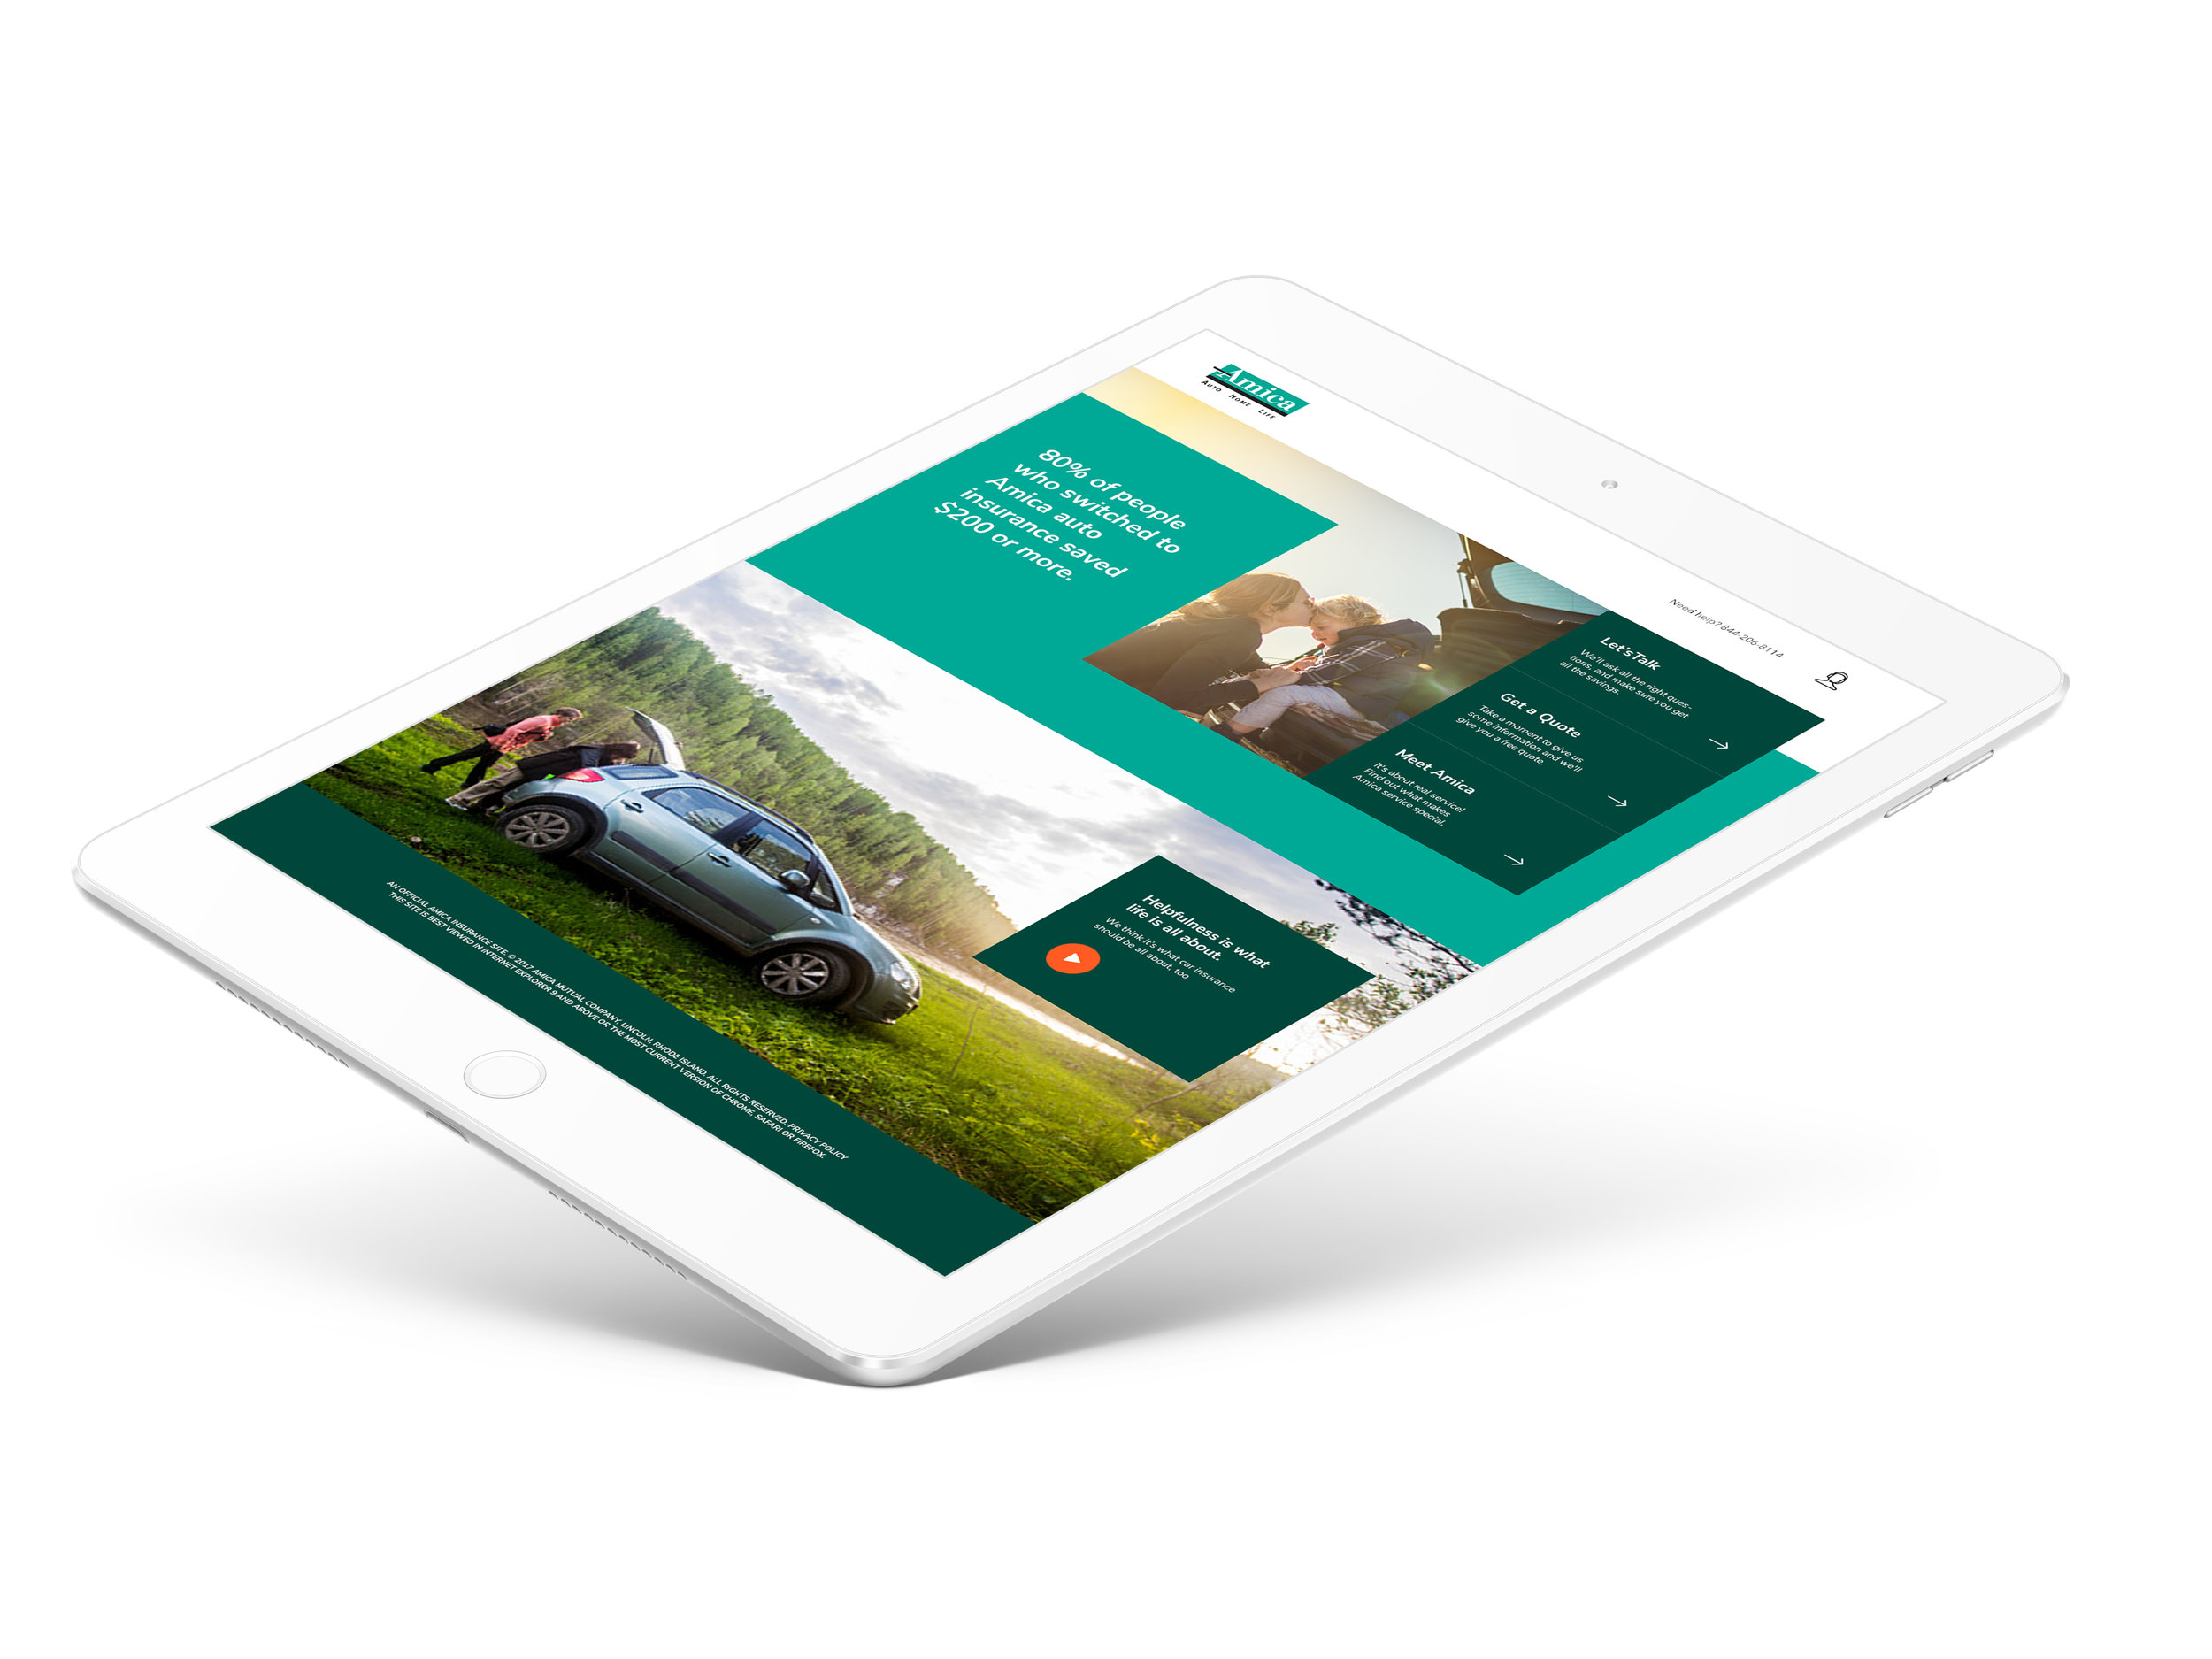 iPad Pro 9.7 White Mockup.jpg